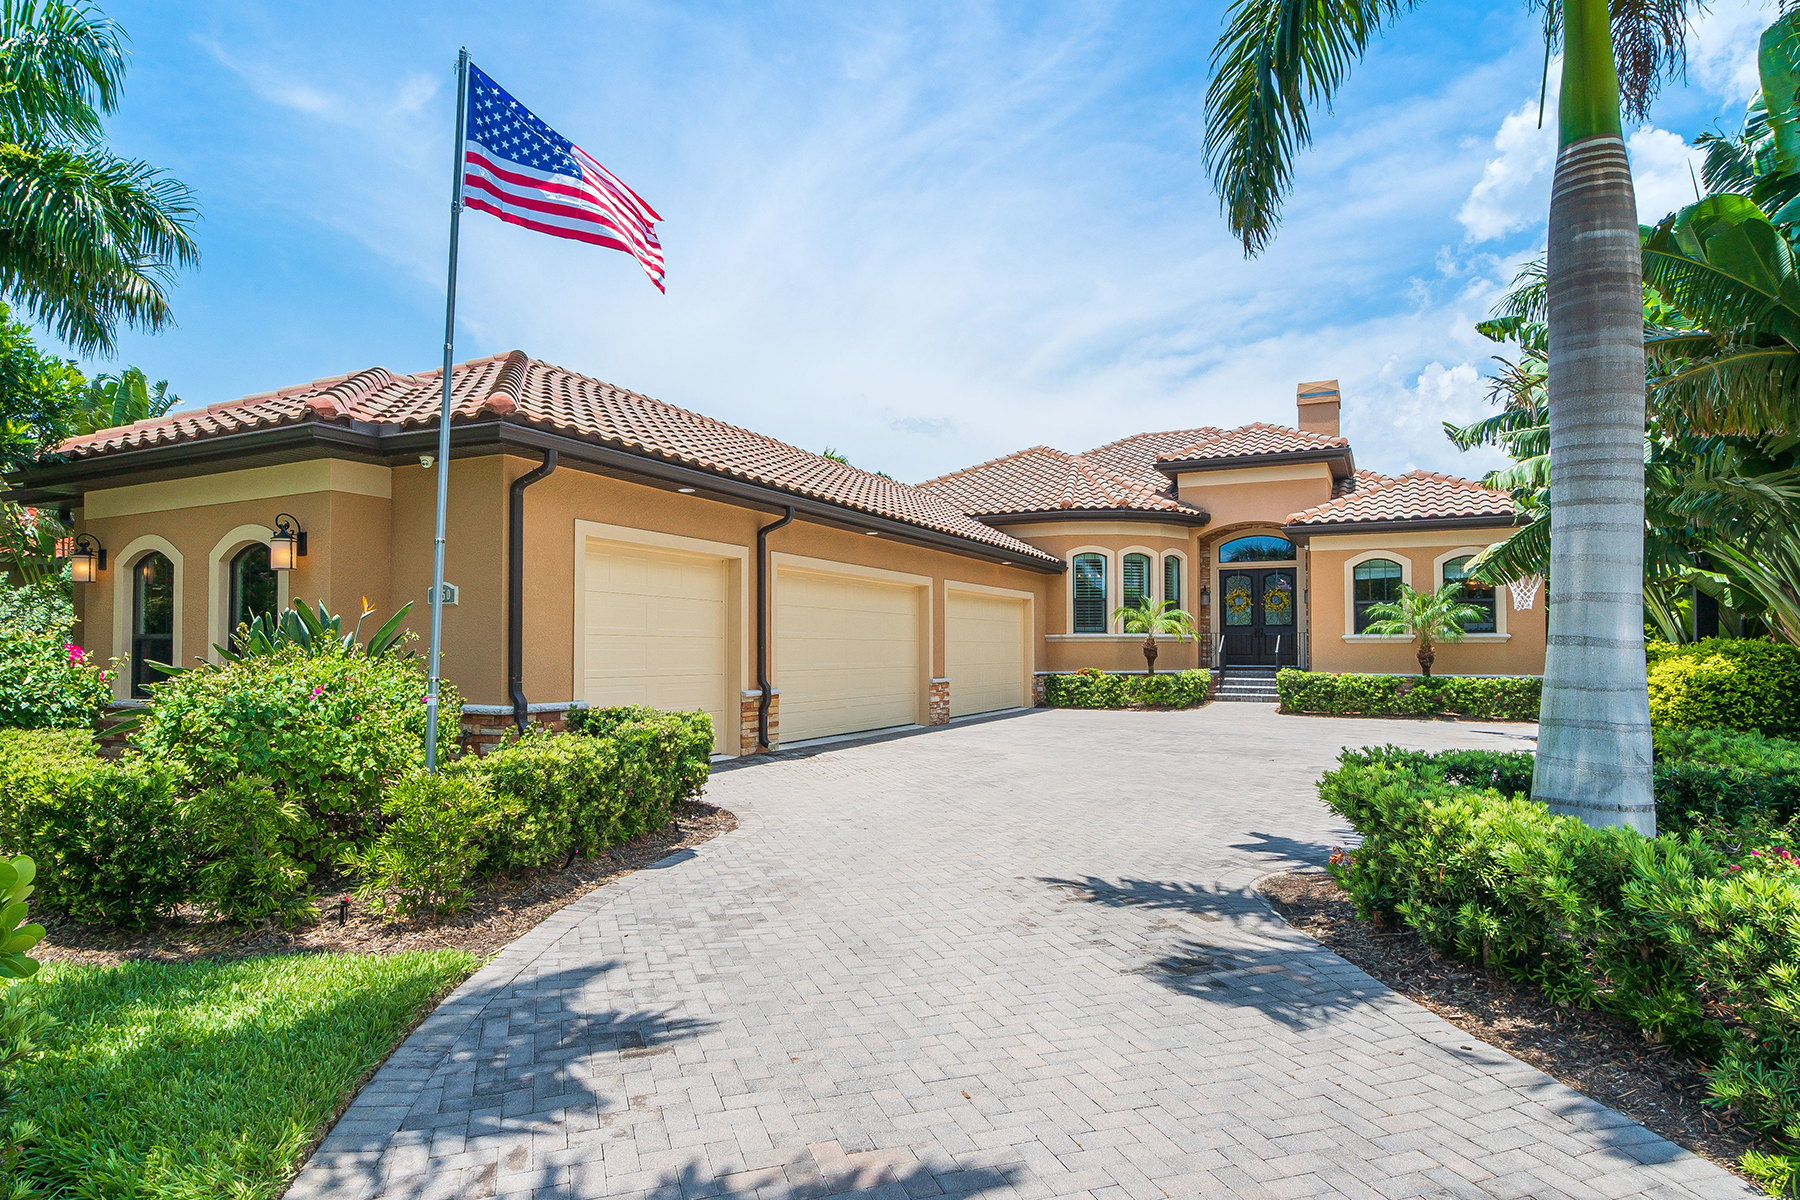 Single Family Homes for Sale at CASEY KEY ESTATES 1050 Gulf Winds Way, Nokomis, Florida 34275 United States